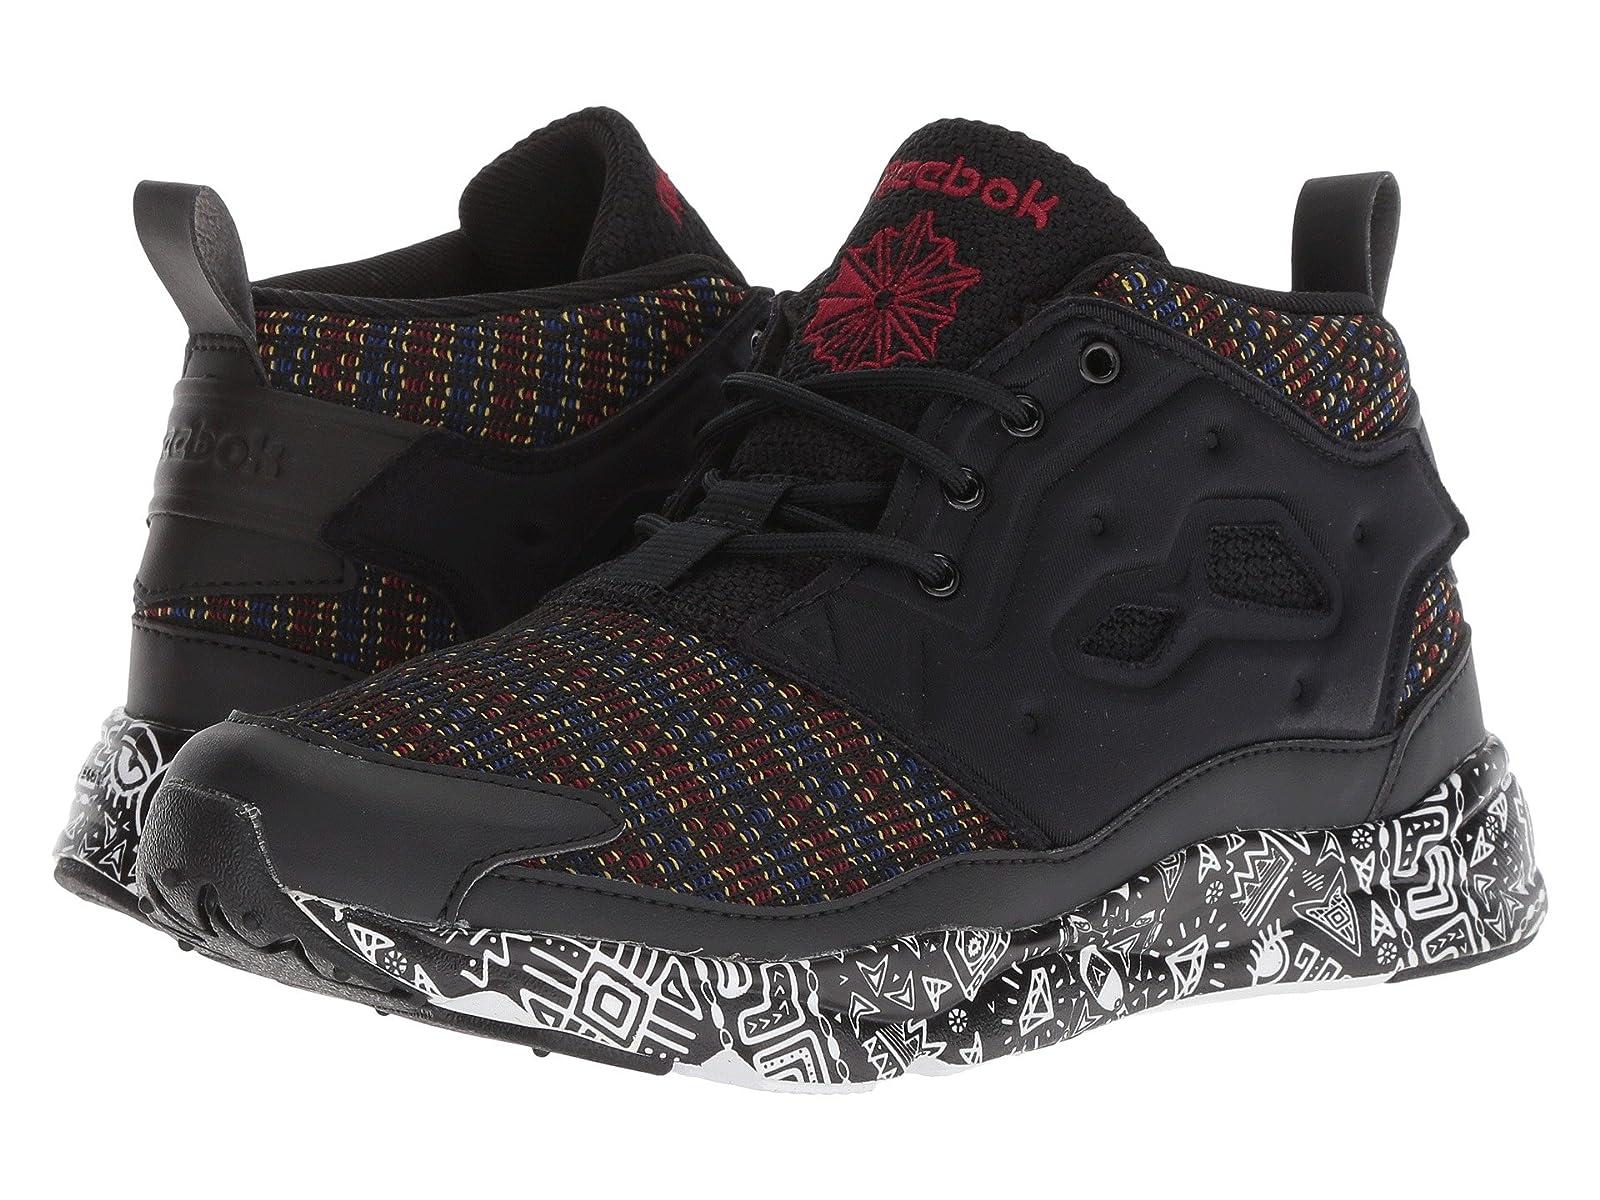 Reebok Furylite Chukka AFRCheap and distinctive eye-catching shoes